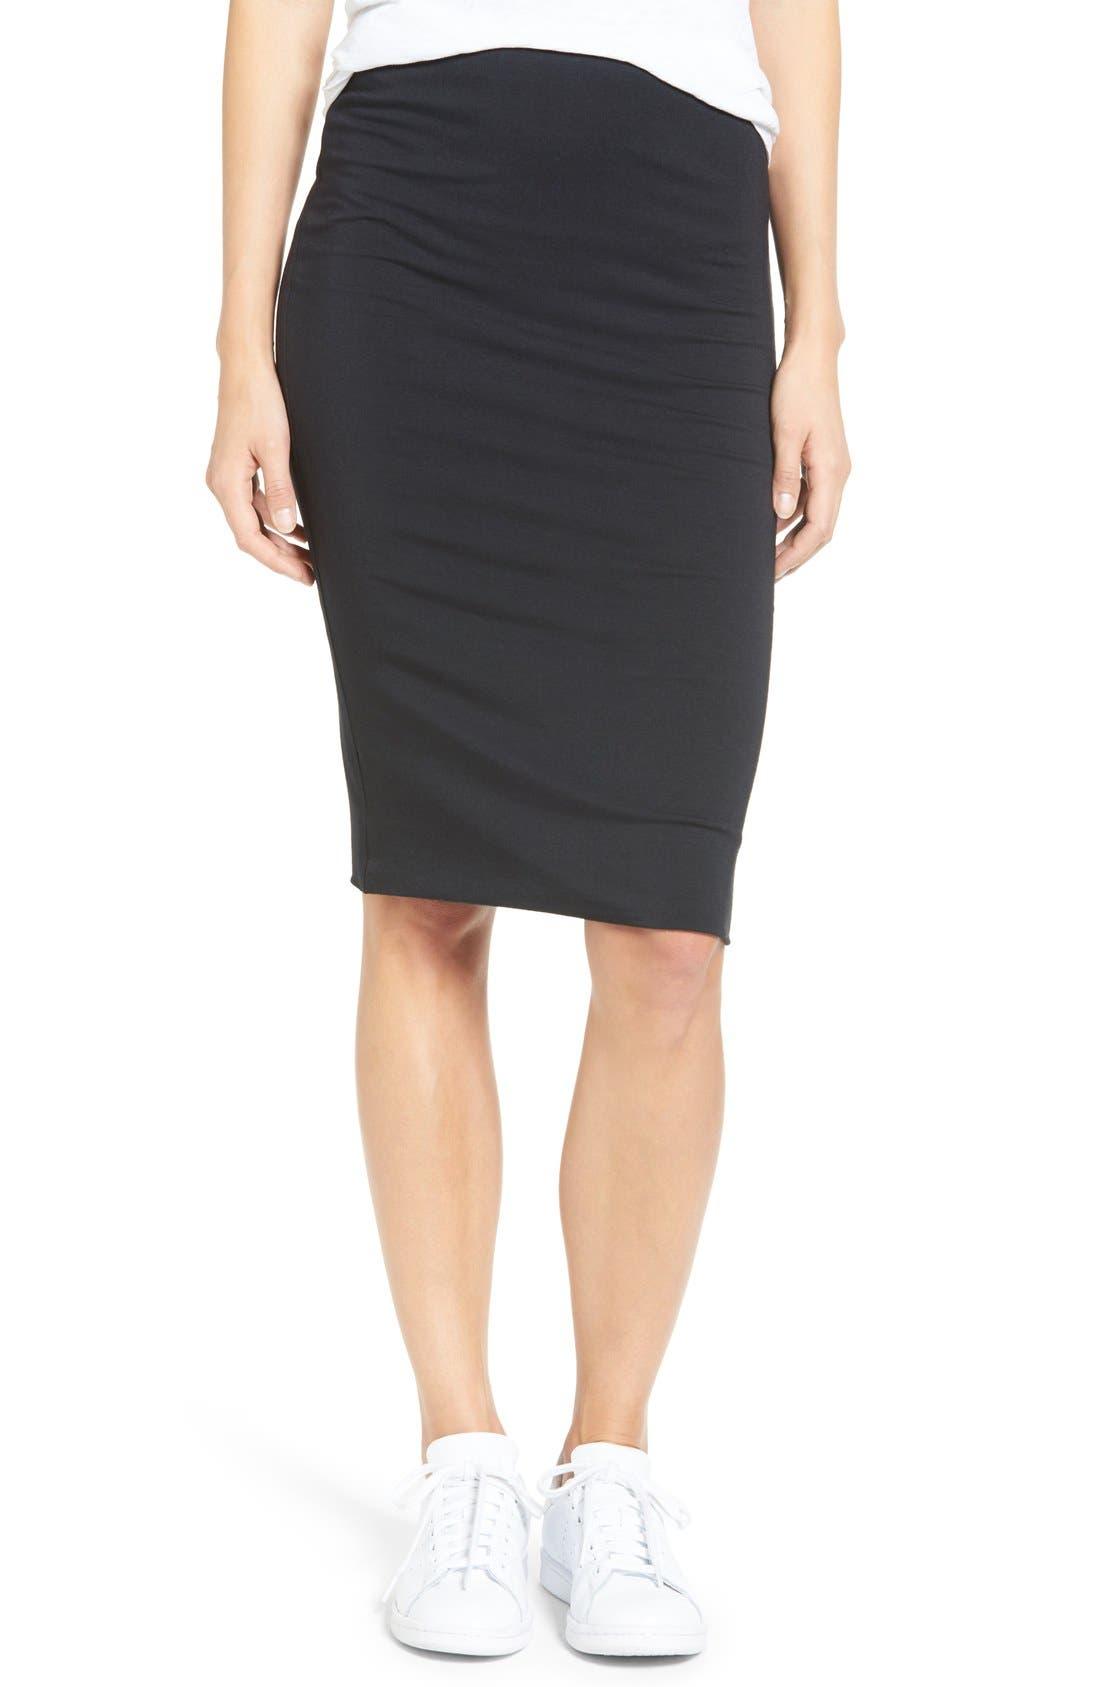 AMOUR VERT 'Yuma' Stretch Knit Skirt in Black